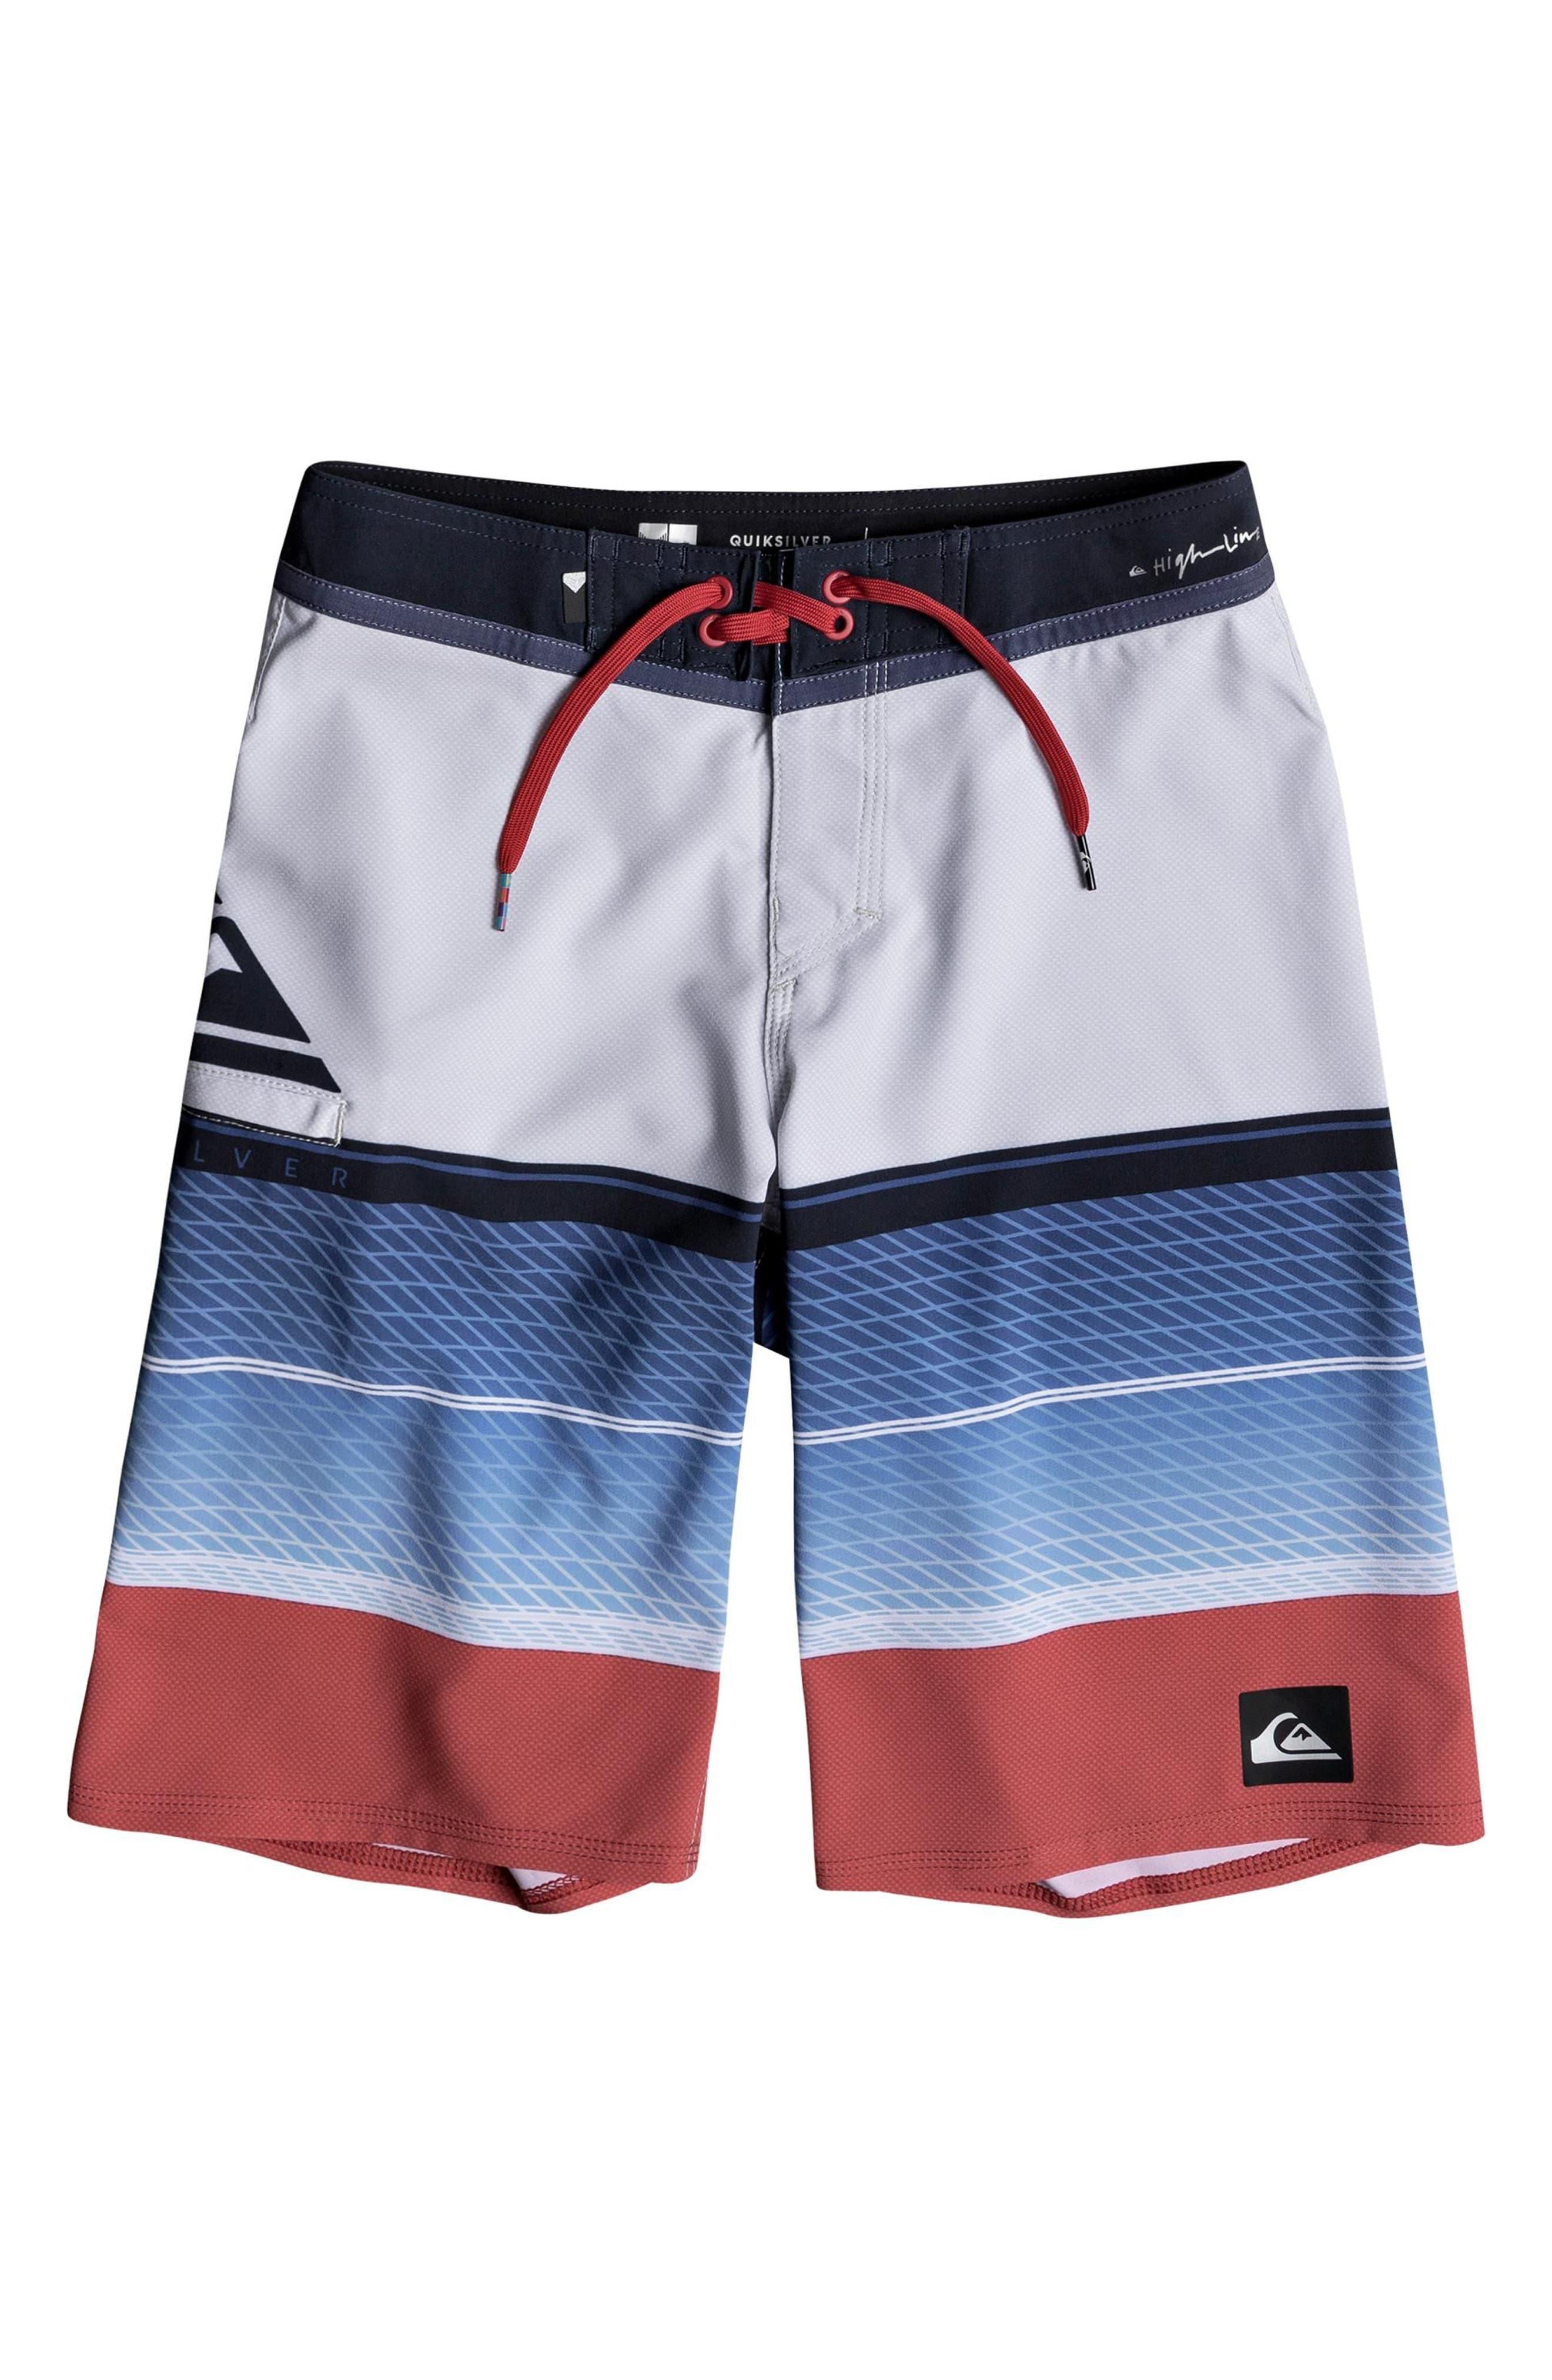 Highline Slab Board Shorts,                             Main thumbnail 1, color,